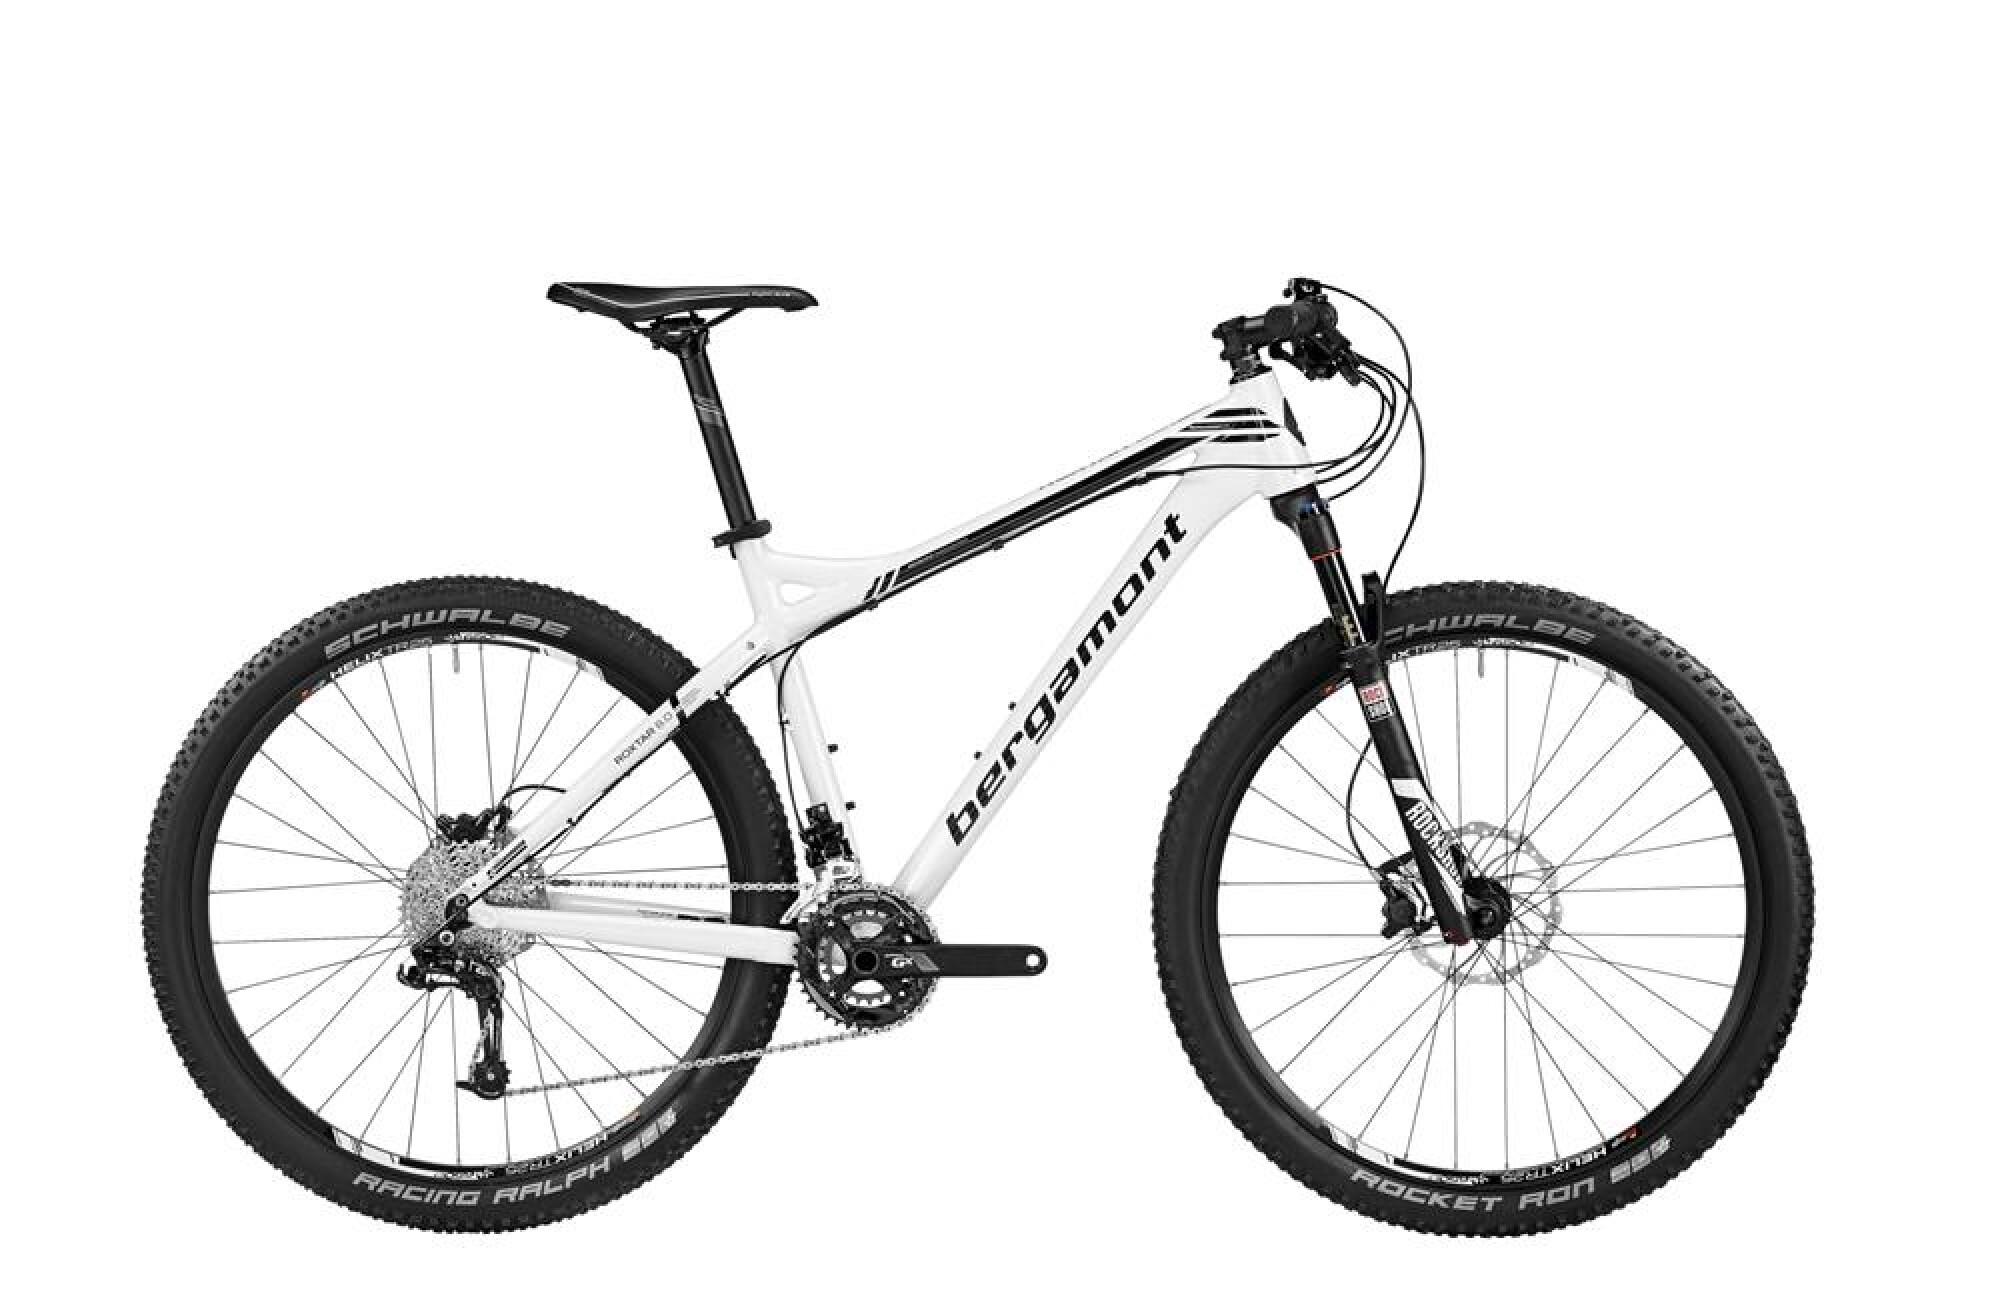 mountainbike bergamont roxtar 8 0 2016 bei. Black Bedroom Furniture Sets. Home Design Ideas